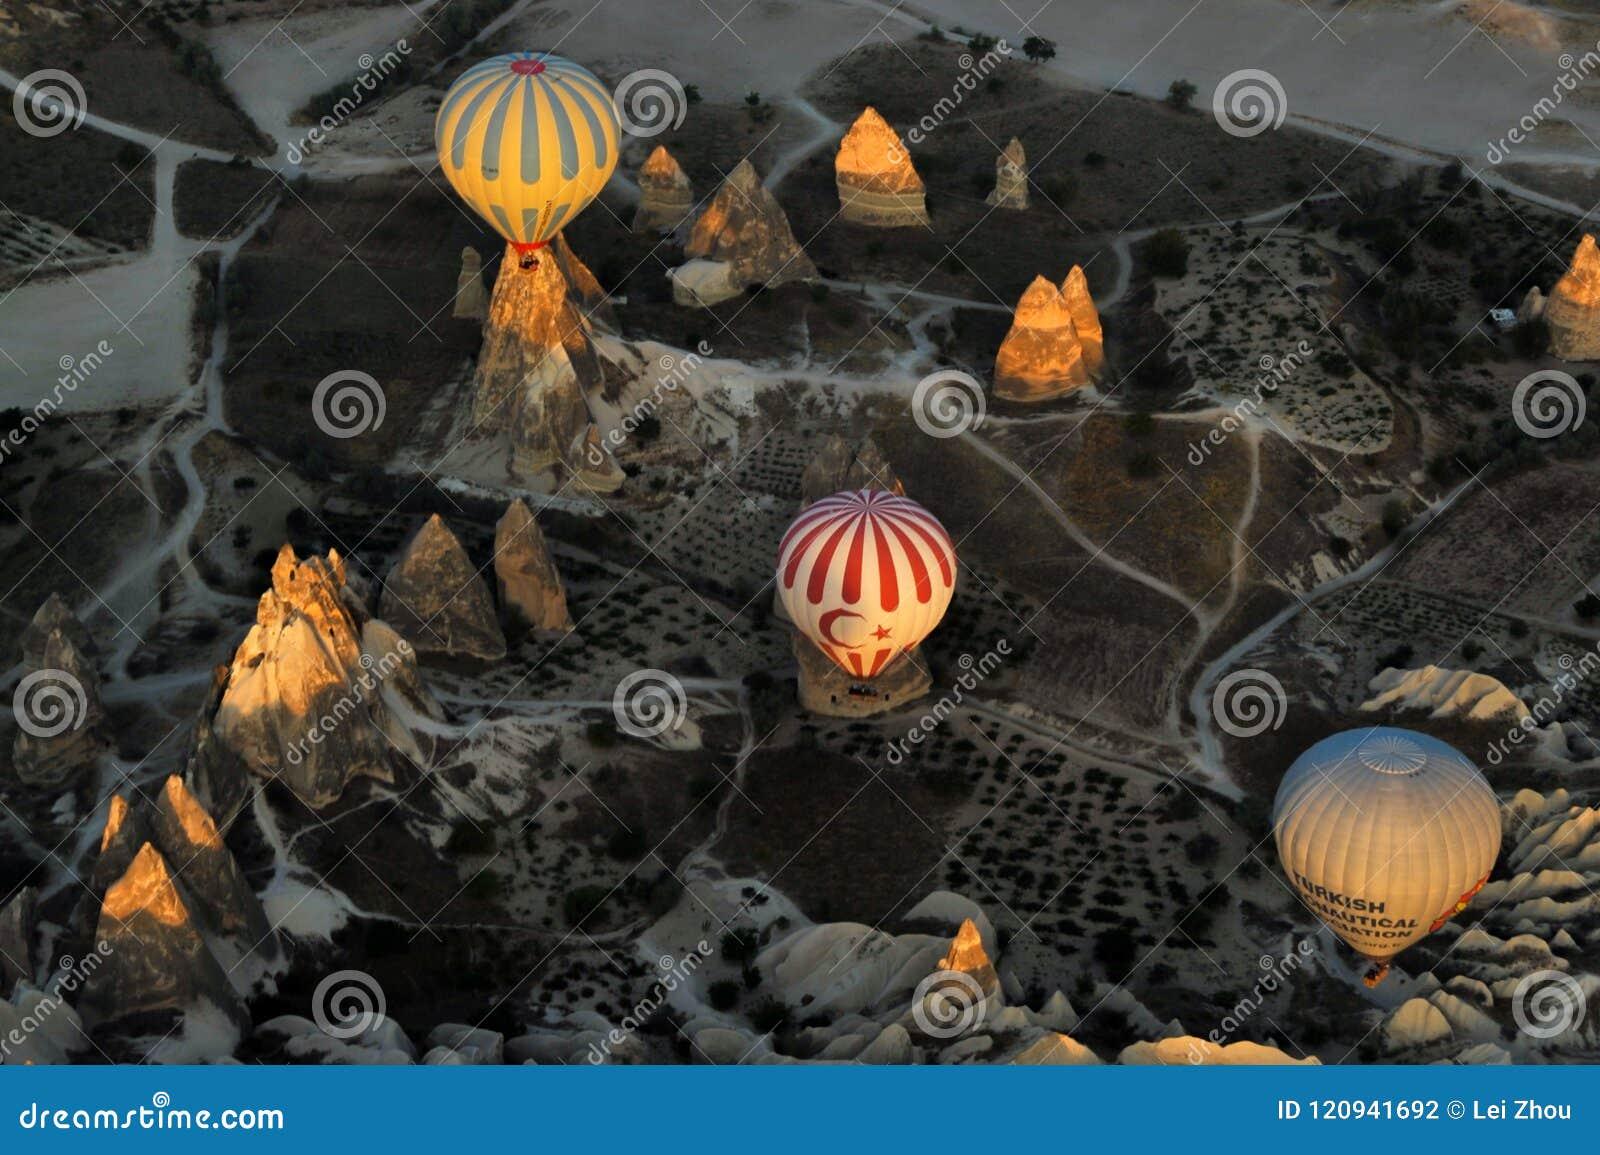 A beautiful scene on a hot air balloon,Cappadocia,Turkey